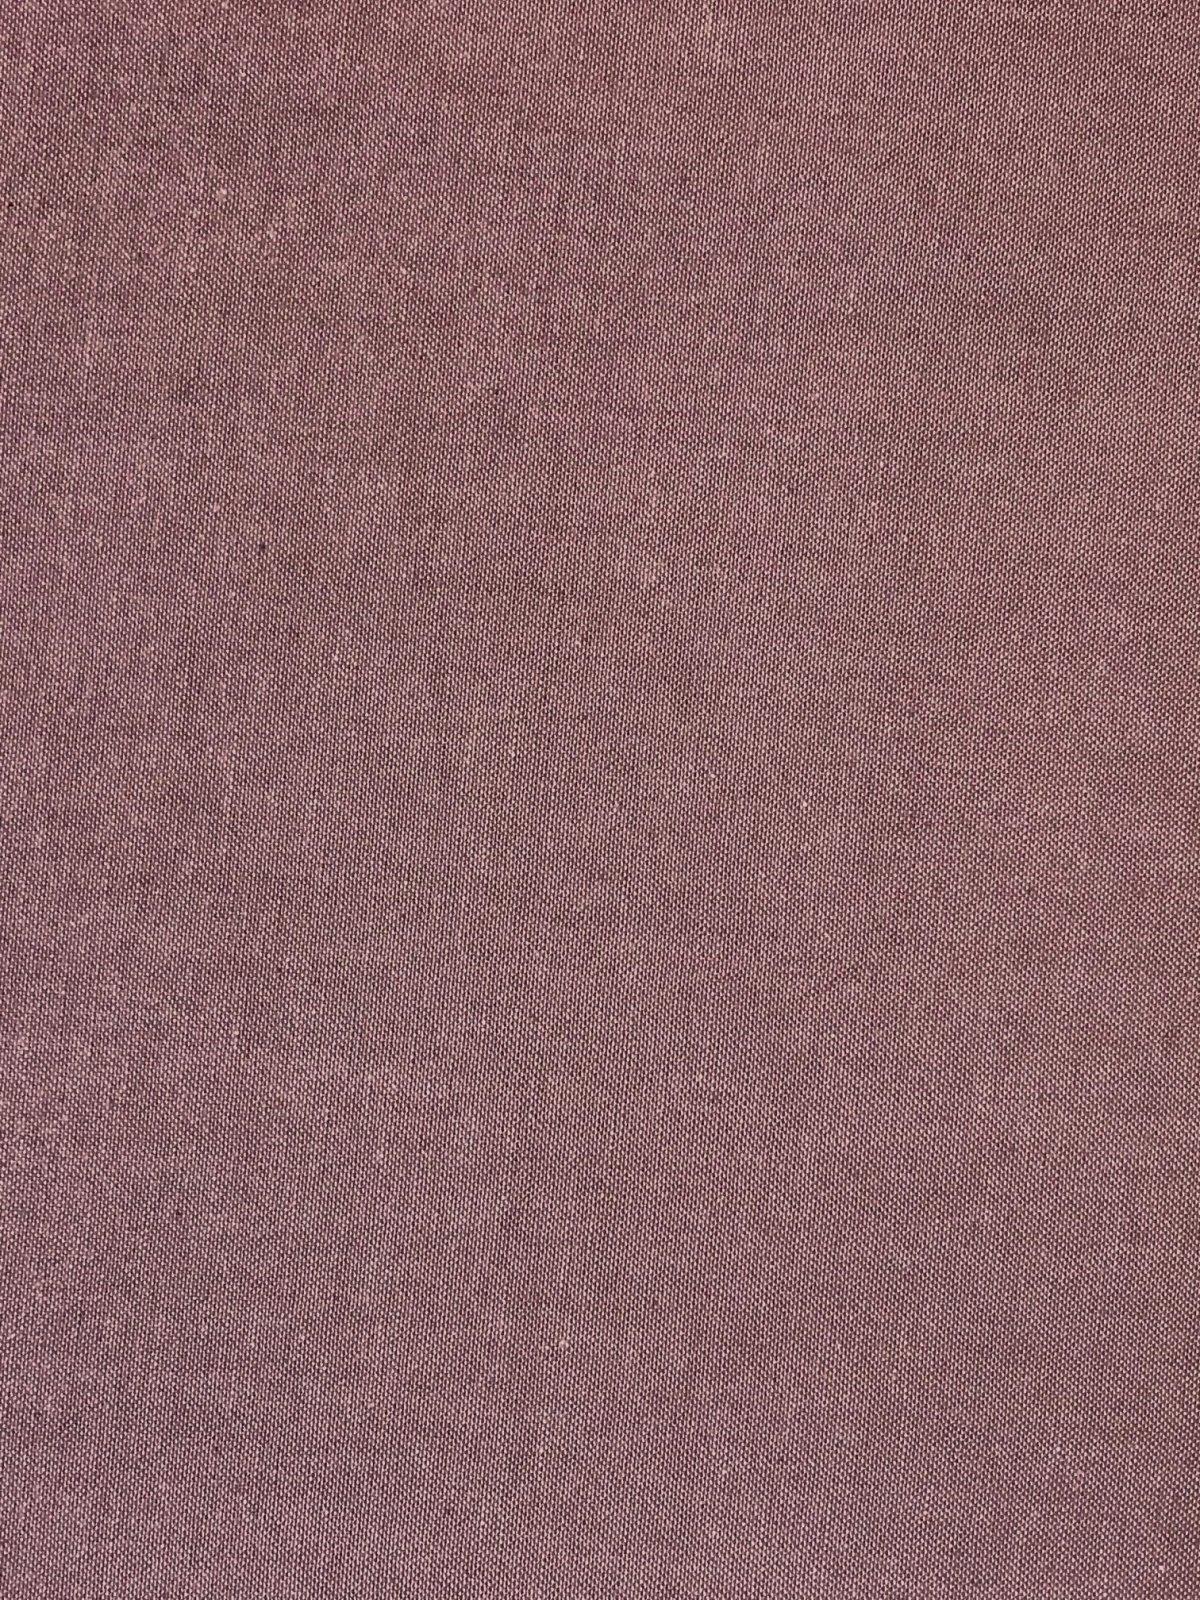 Kent Chambray 2927 Red-Brown Diamond Textiles